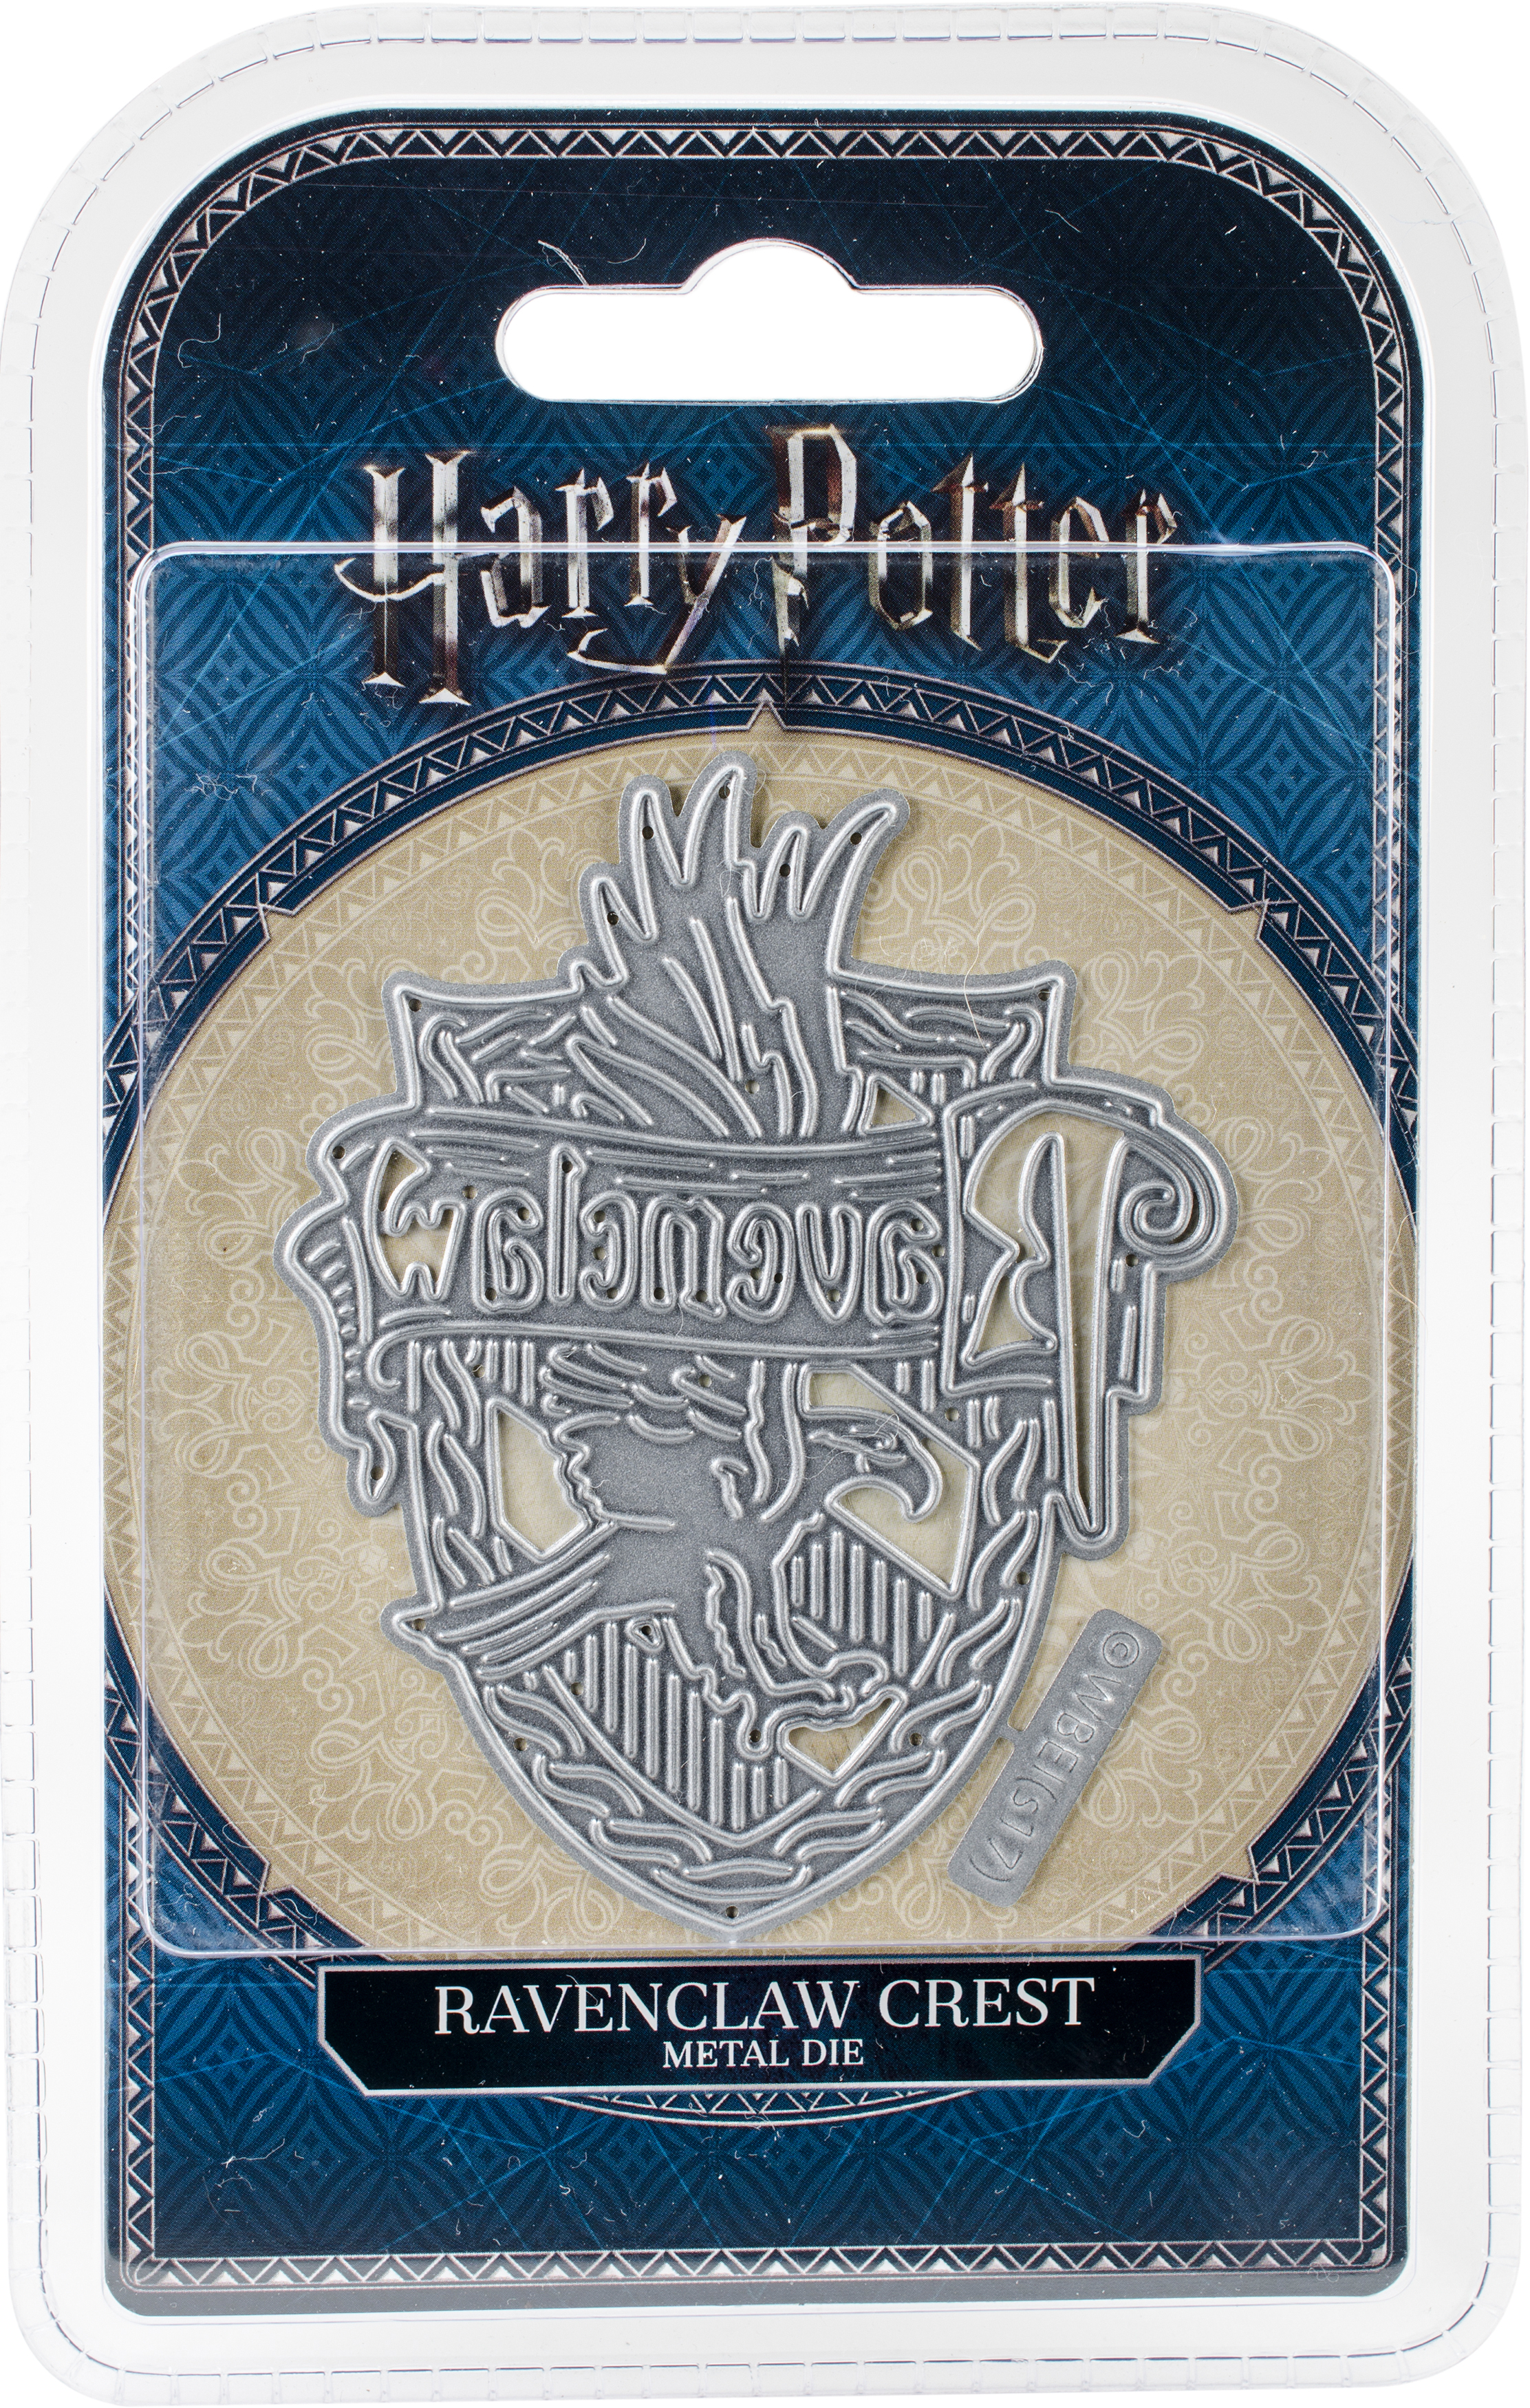 ^Harry Potter Ravenclaw Crest Metal Die